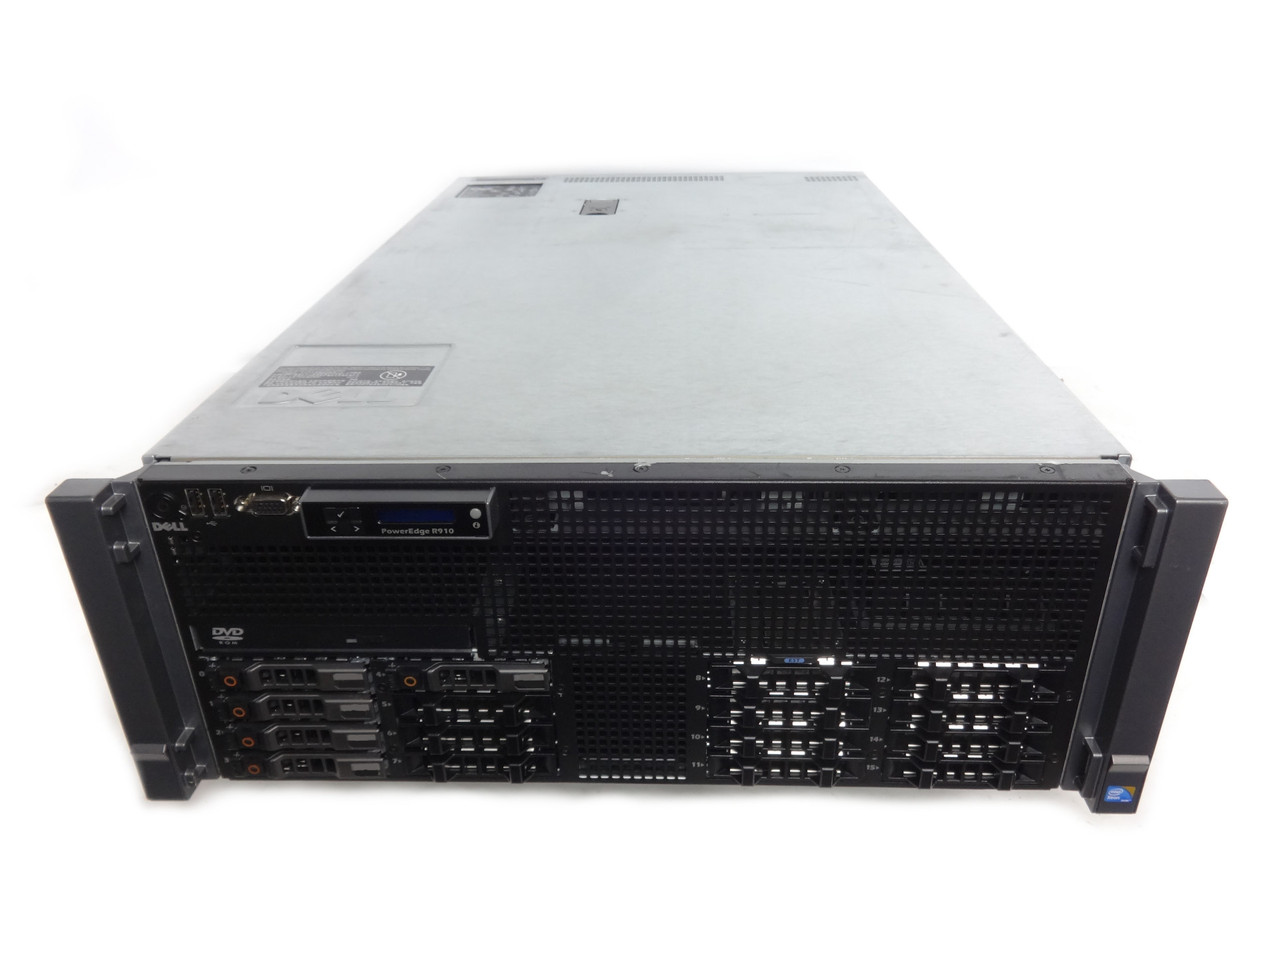 Refurbished Poweredge R910 Server